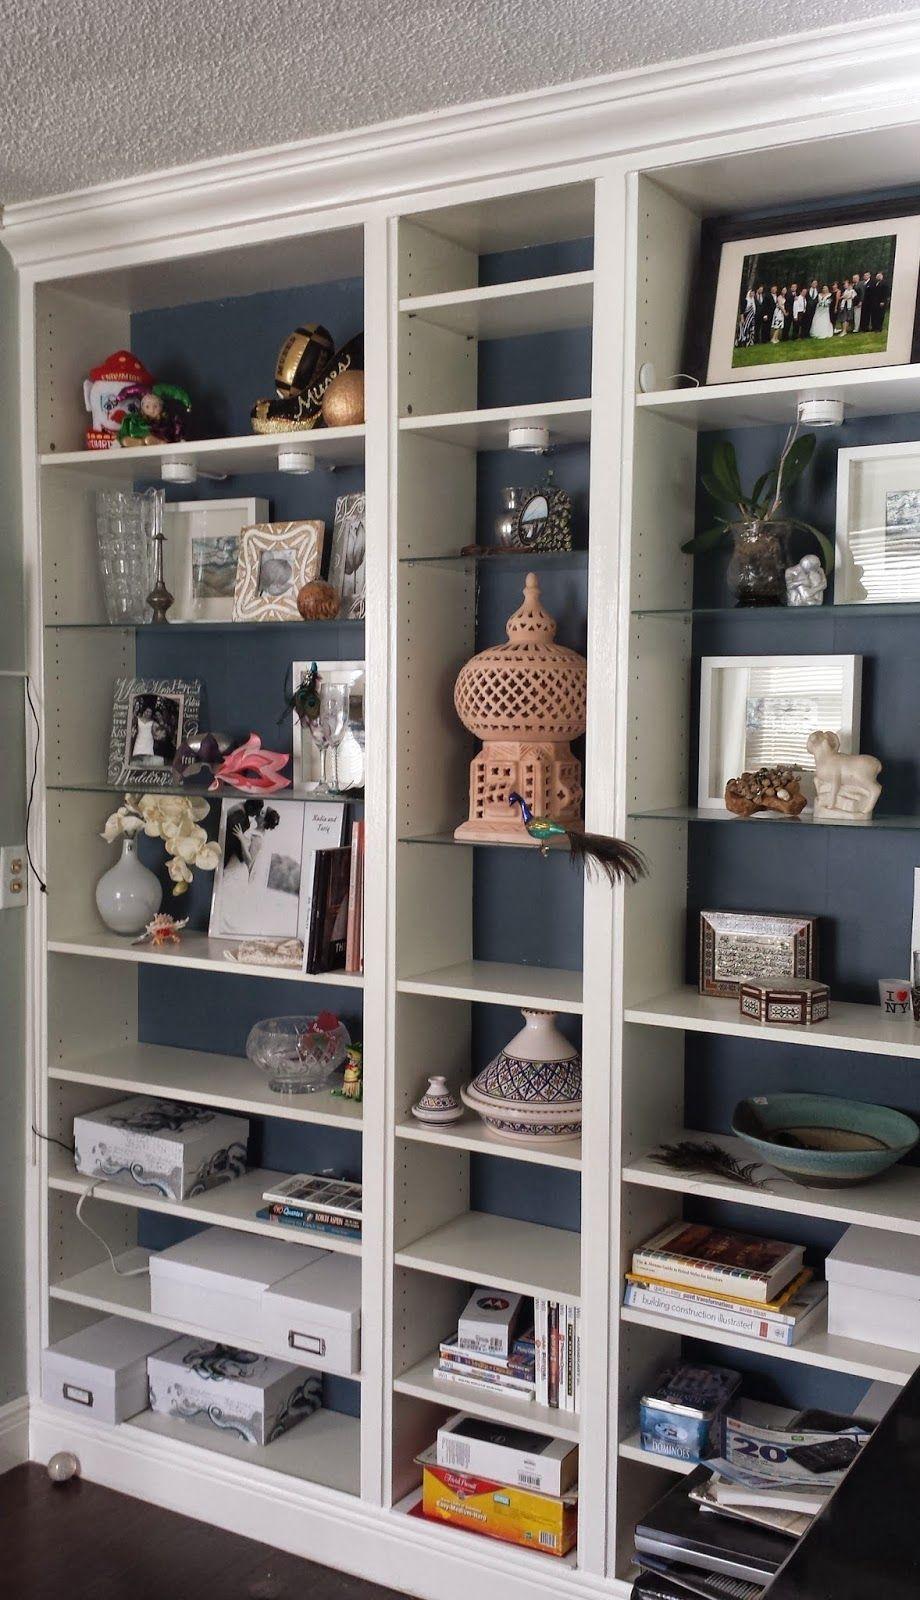 Nadia S Diy Projects Turn An Ikea Billy Bookcase Into A Custom Built In Billy Regal Ideen Billy Regal Dekorieren Einrichtungsideen